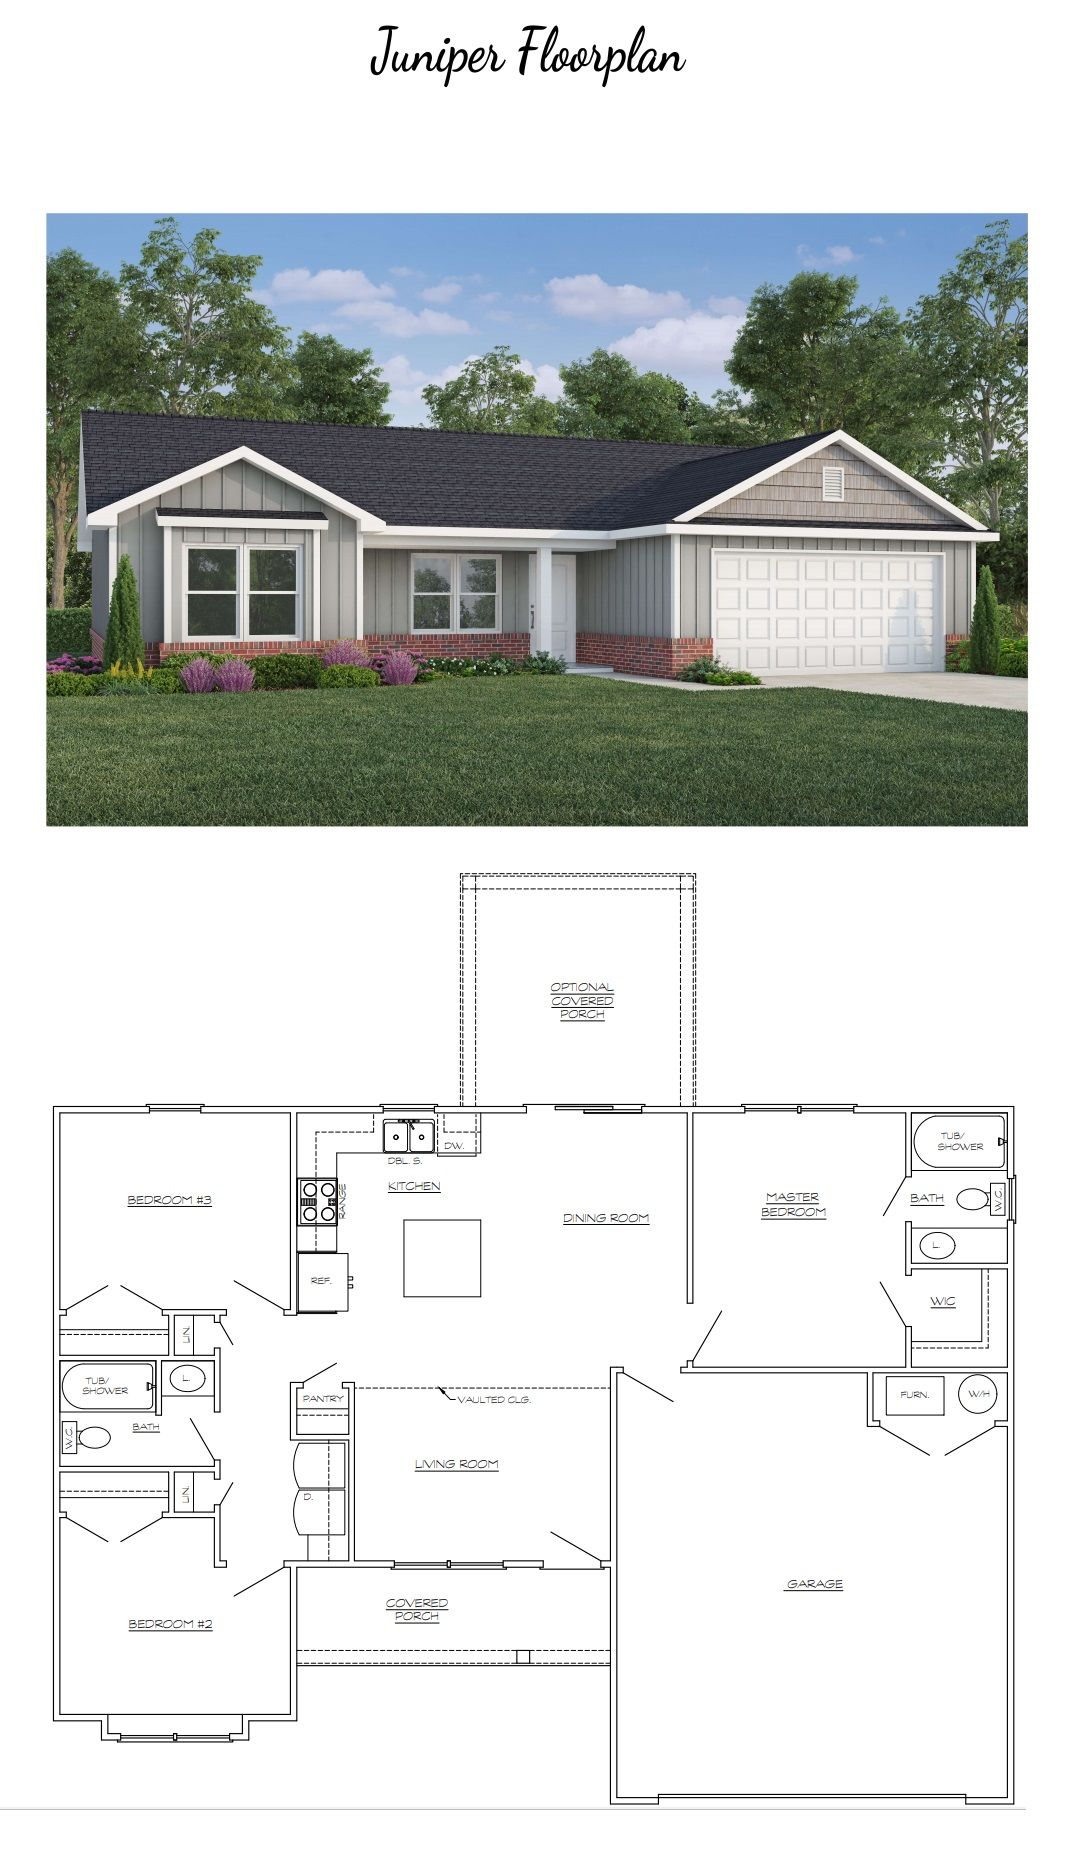 Juniper Floorplan Floor Plans House Floor Plans New Homes